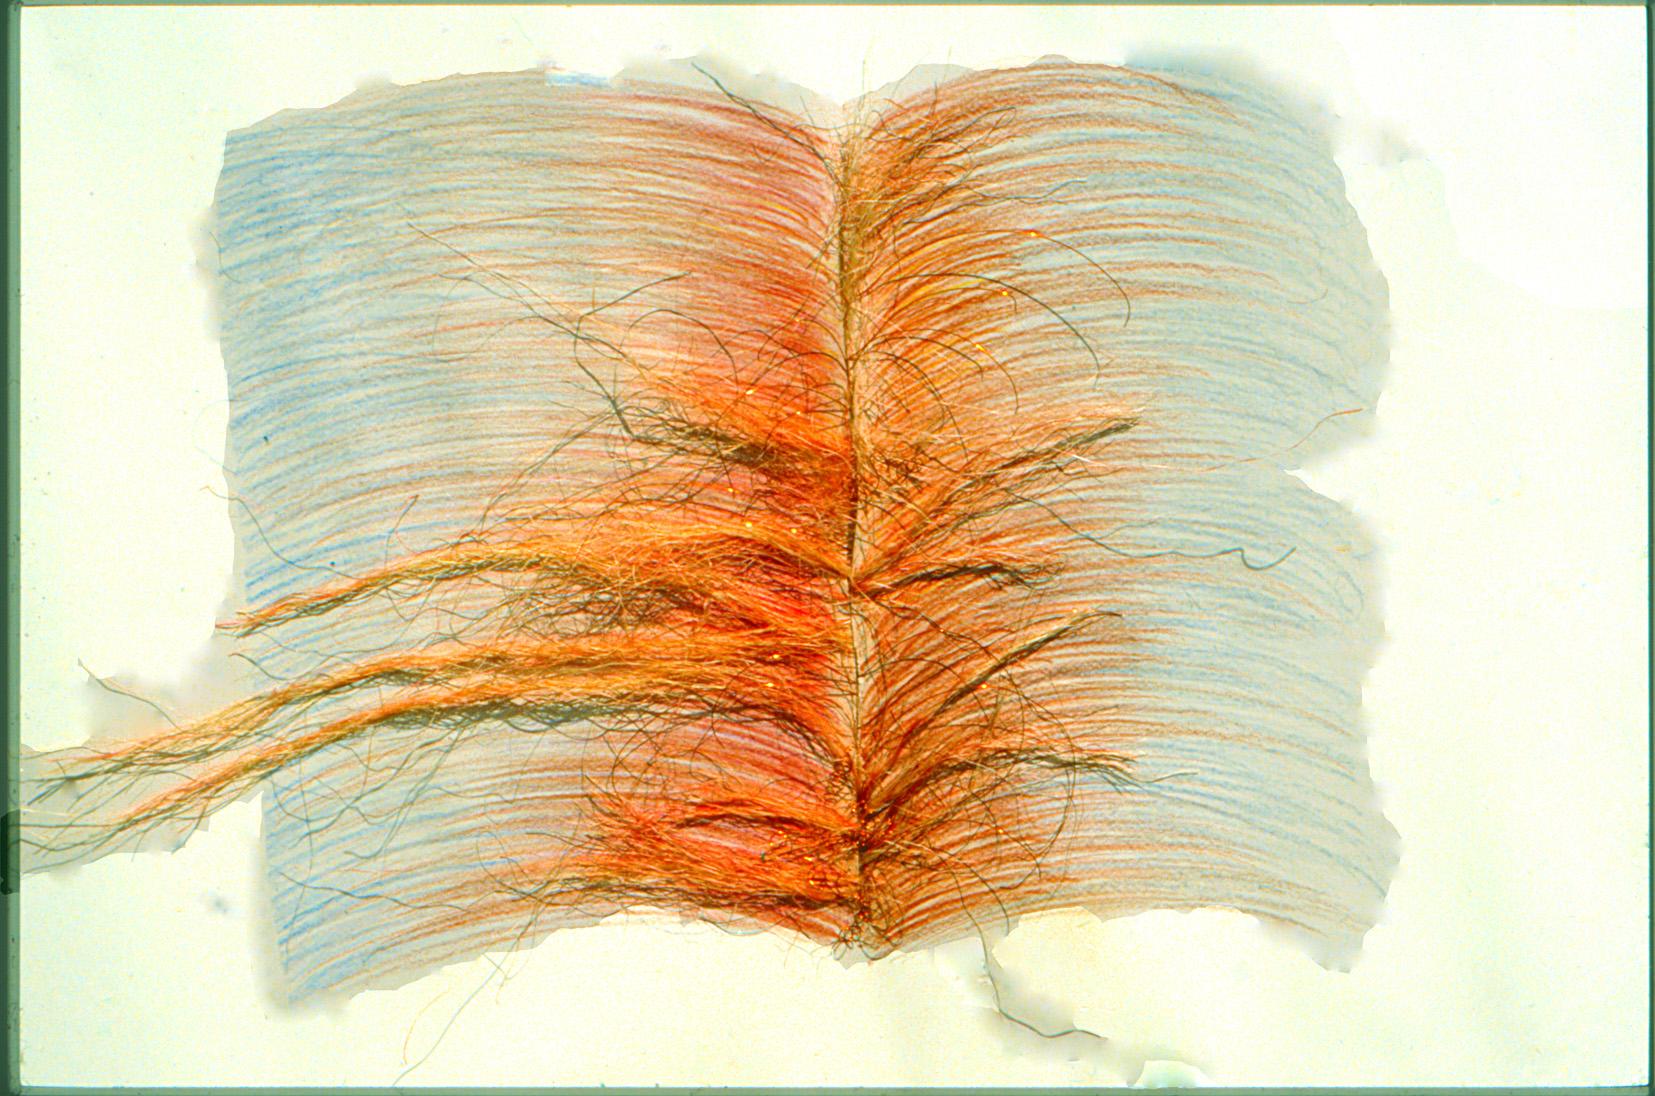 das offene Buch    (72x52x10cm)